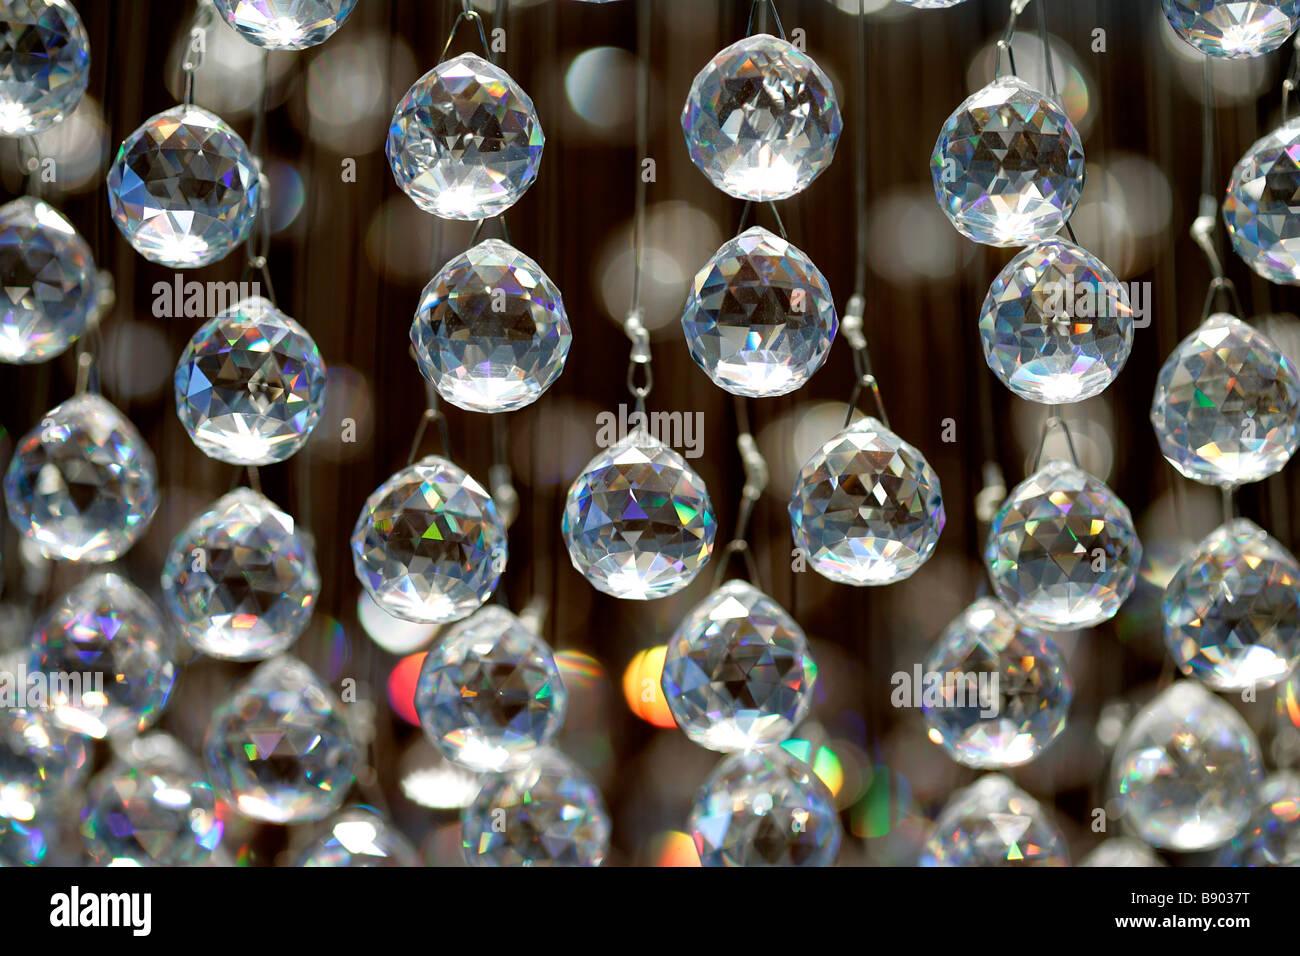 Kronleuchter Glaskugeln ~ Kronleuchter glaskugel decke kronleuchter kristall glaskugeln